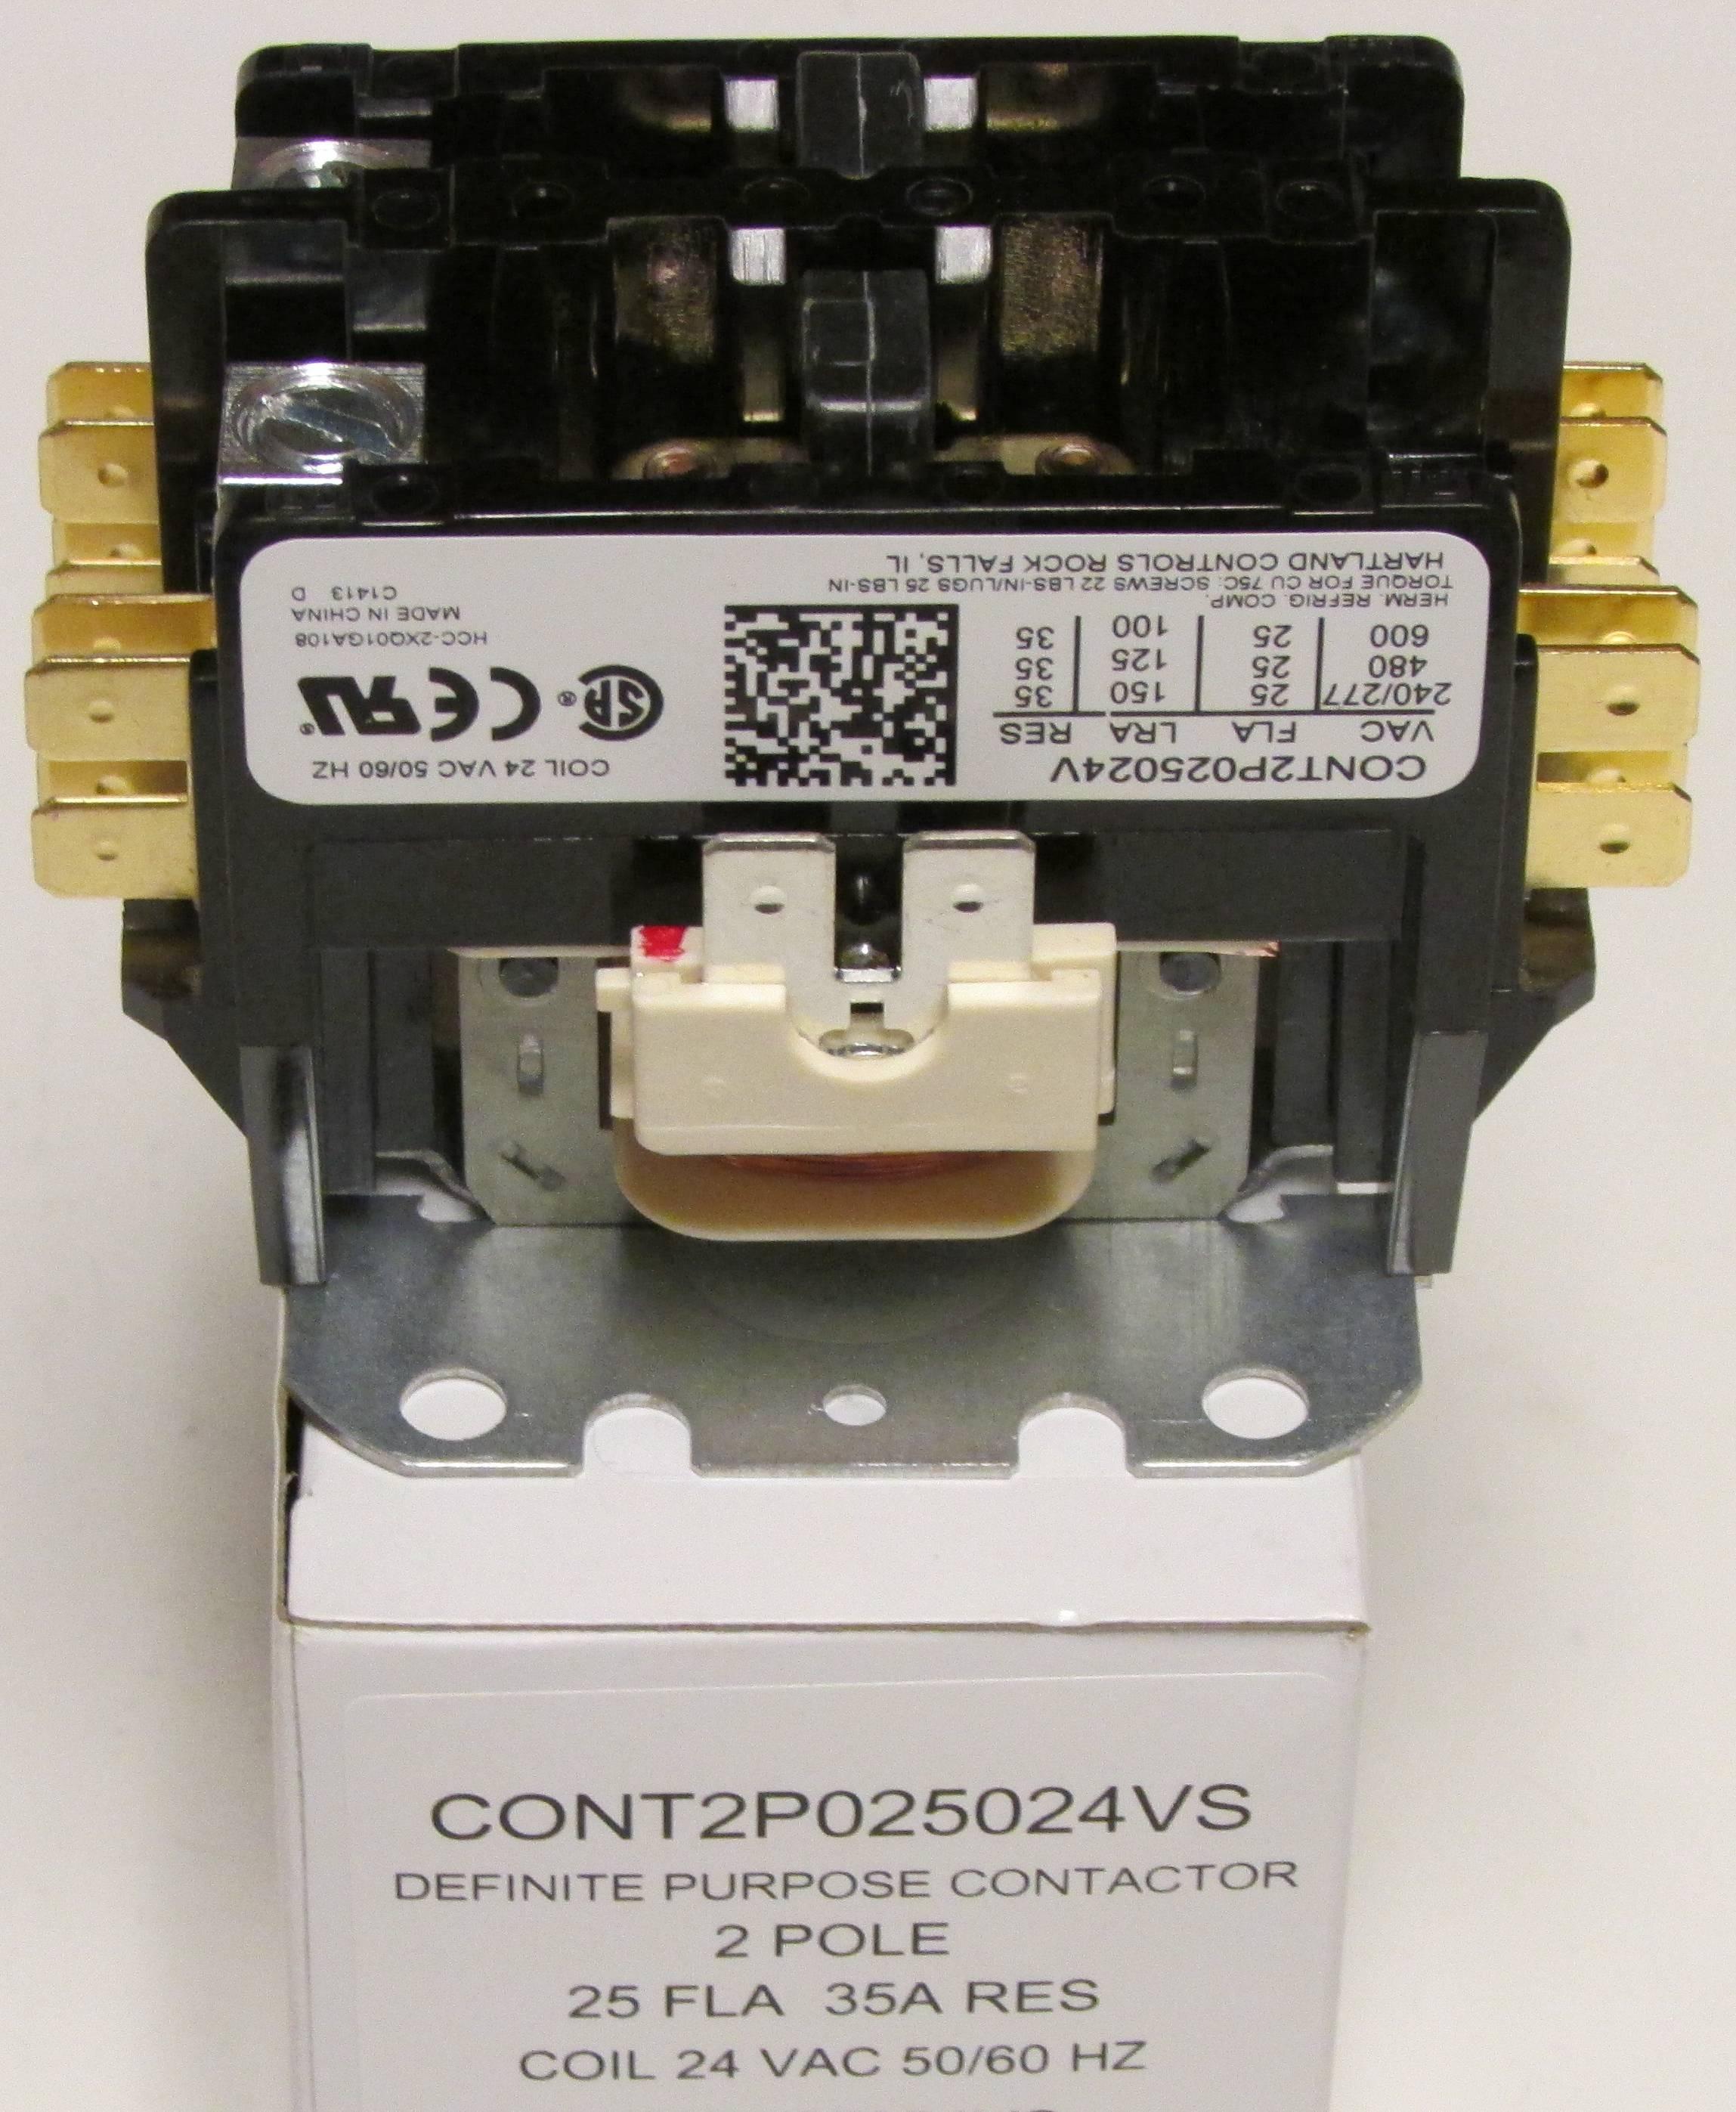 Central Air Conditioner Parts Diagram Cont2p Vs Goodman Air Conditioner Contactor Of Central Air Conditioner Parts Diagram